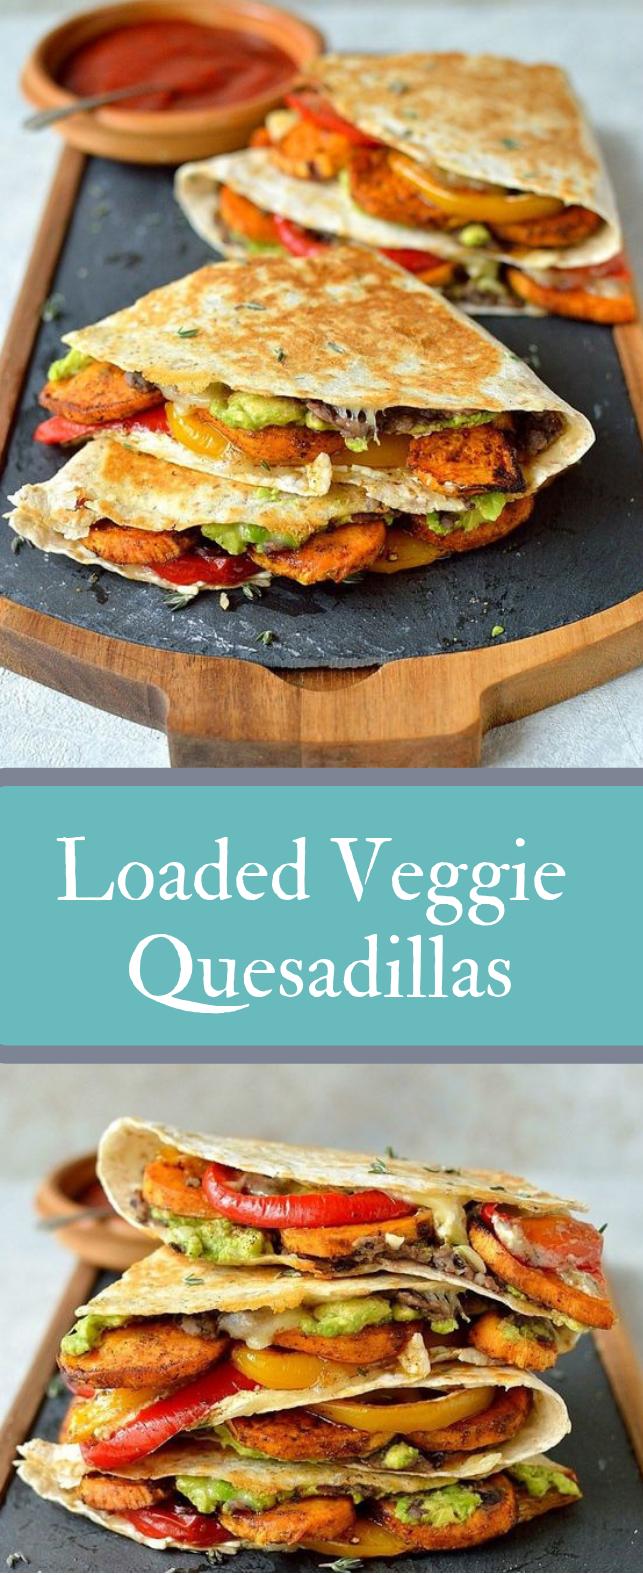 Loaded Veggie Quesadillas #familyrecipes #foods images